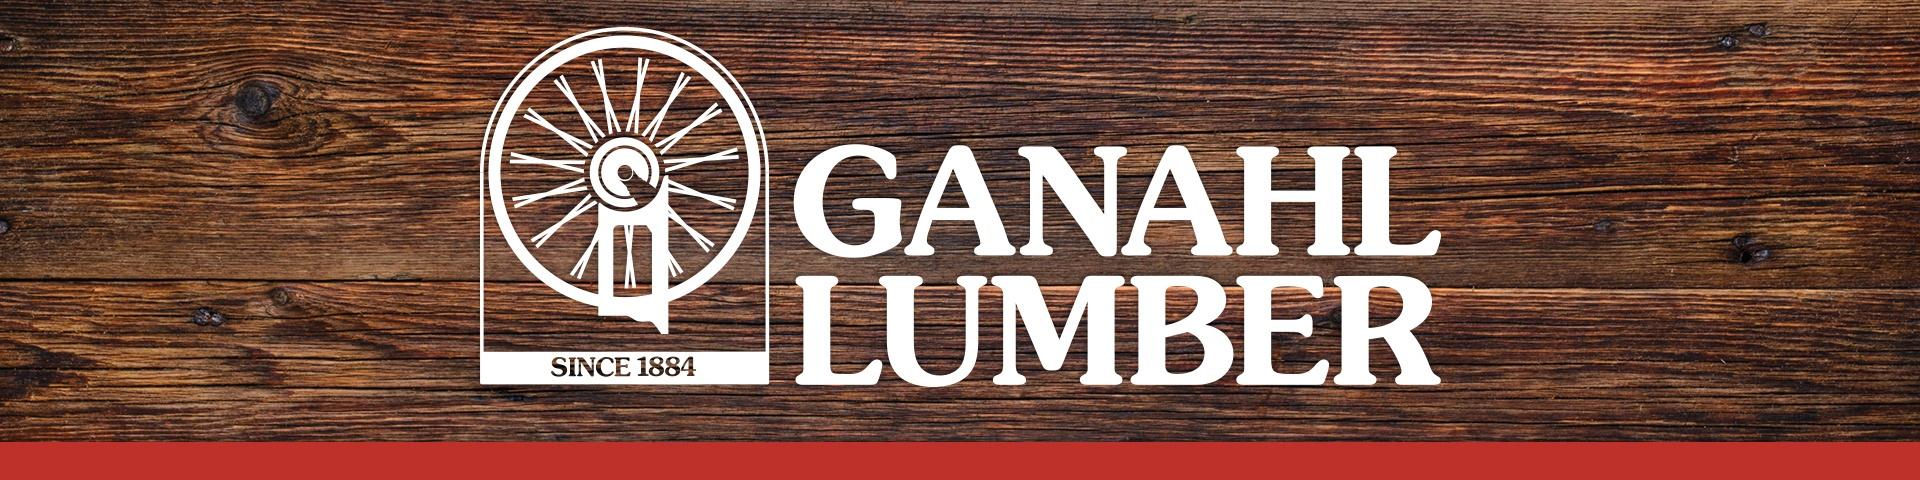 Ganahl Lumber